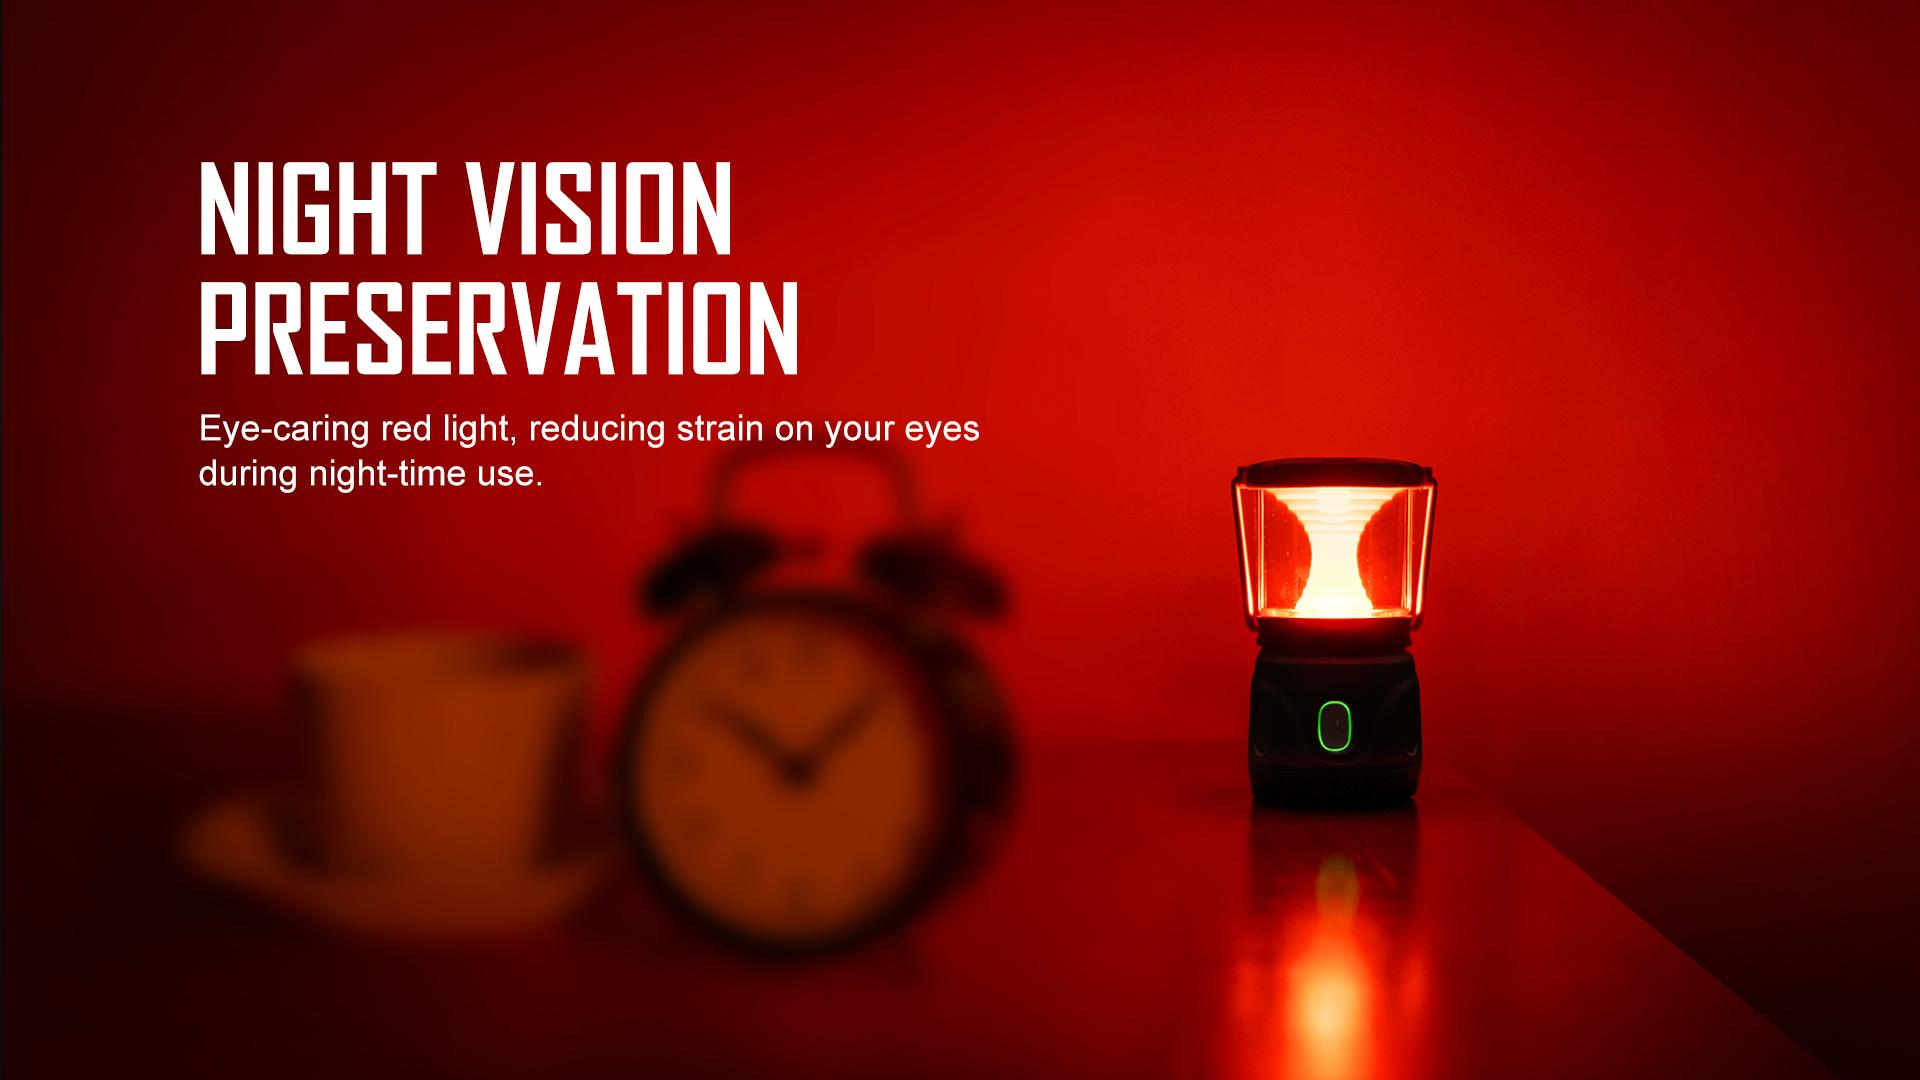 Olantern Mini has night vision